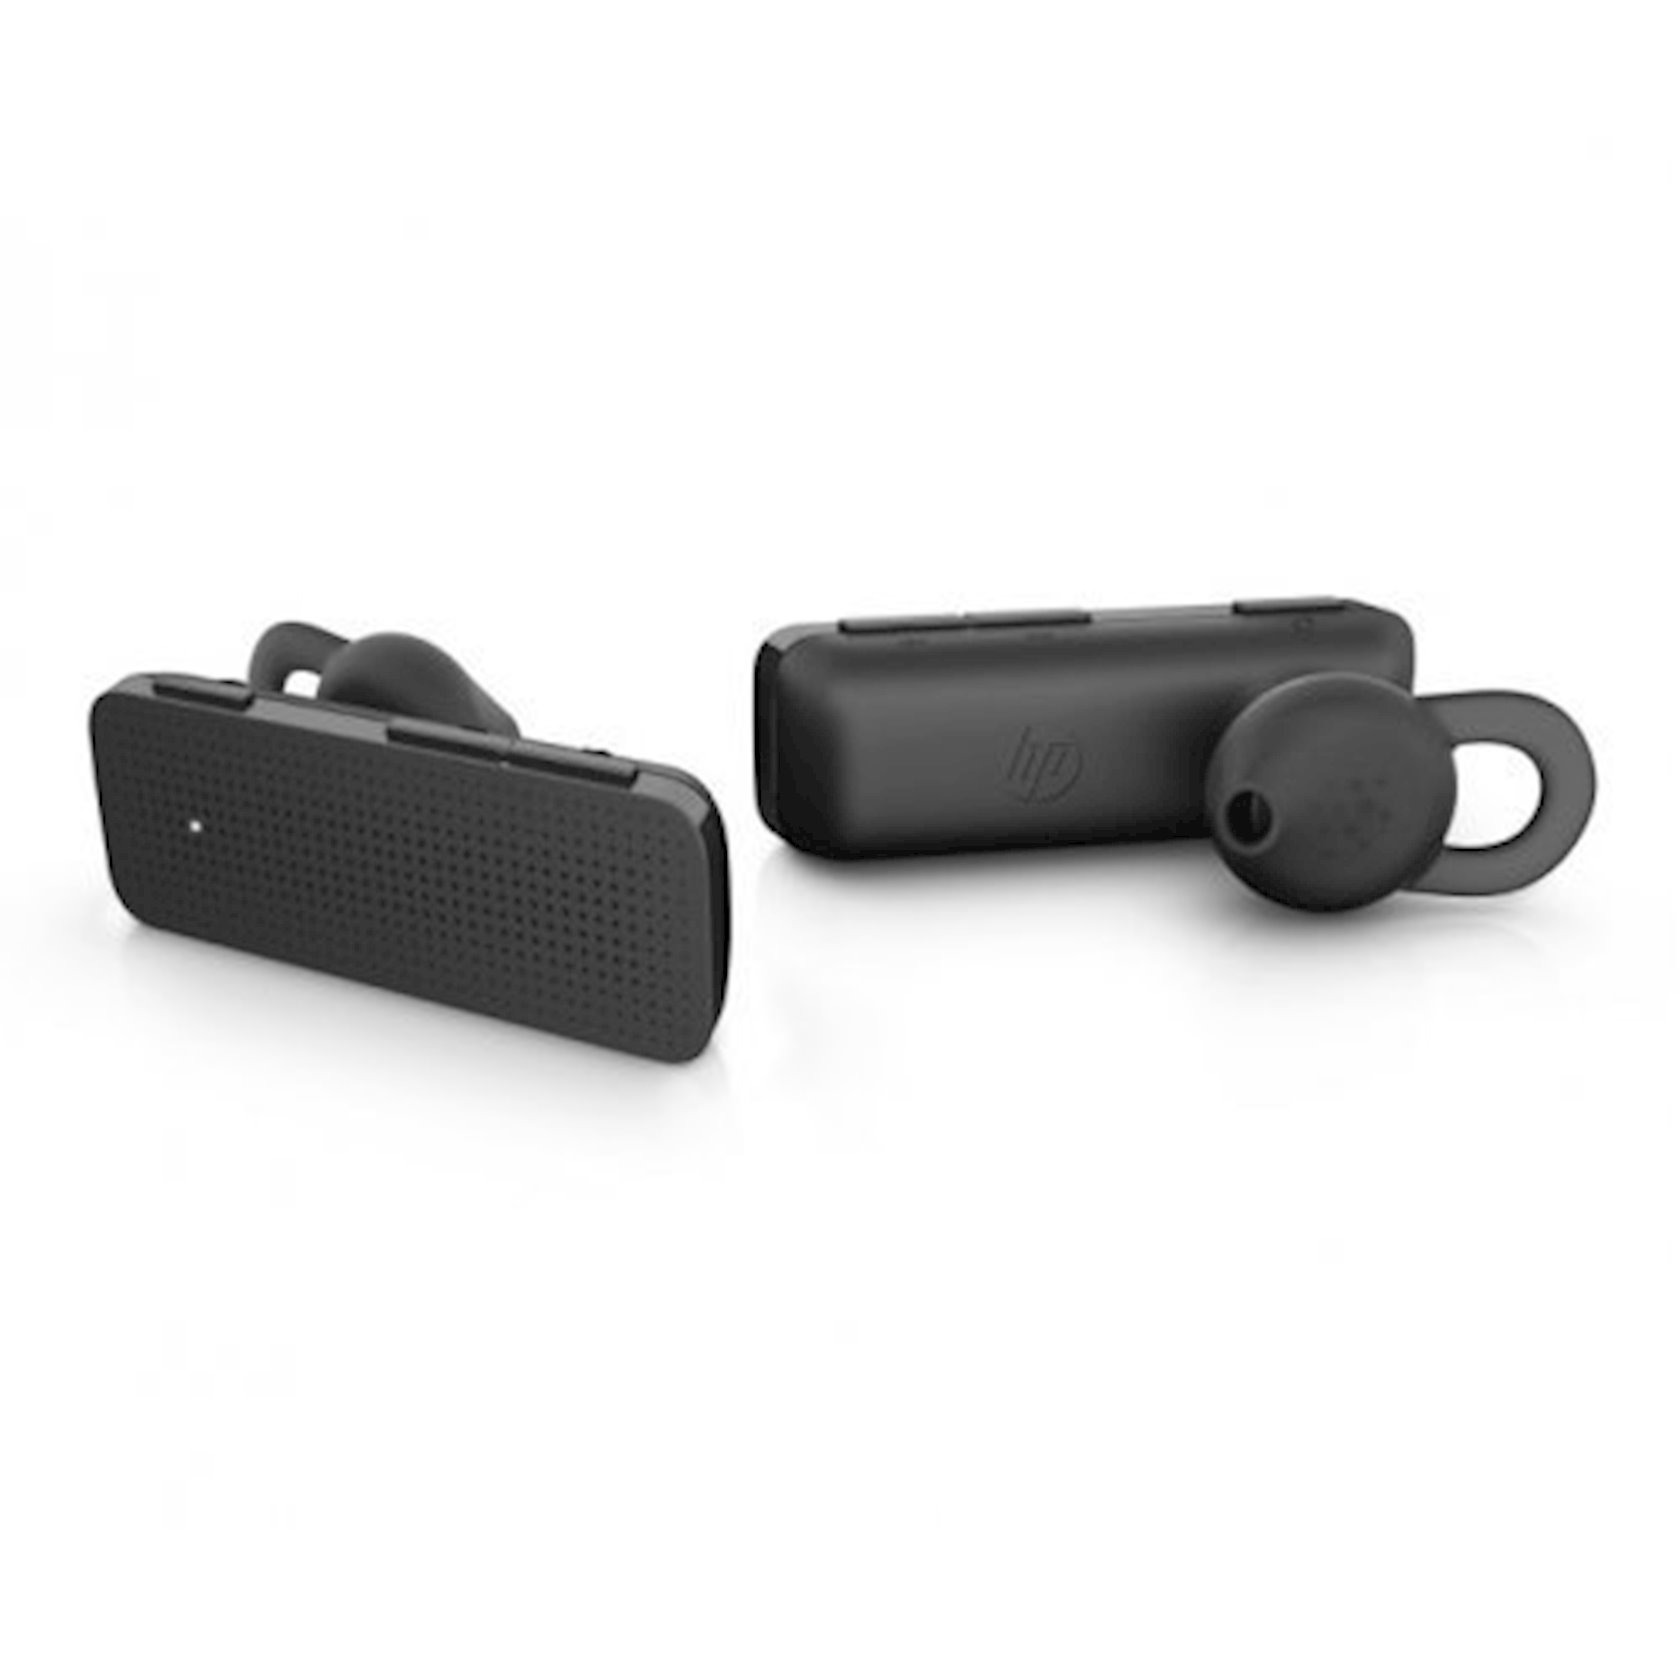 Simsiz Qarnitur  HP H3200 BT Wireless Headset G1Y53AA Black